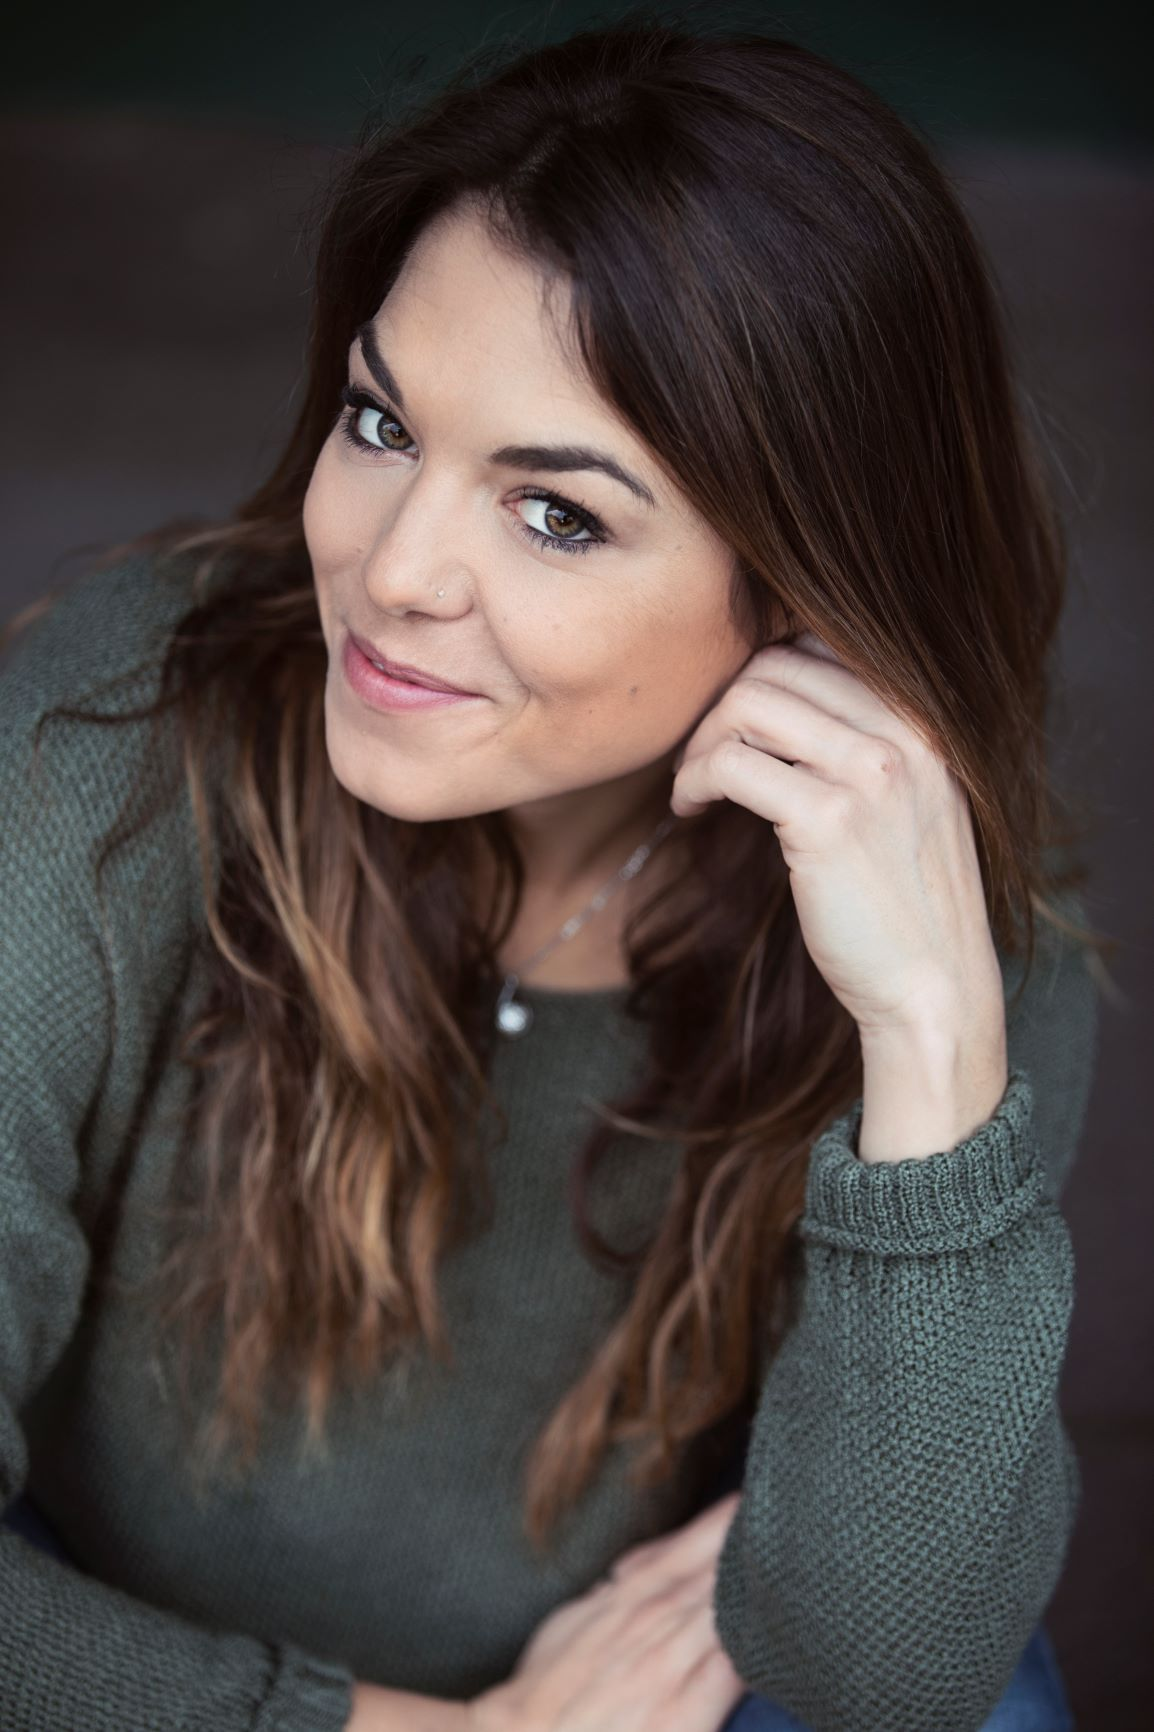 Chiara Casali